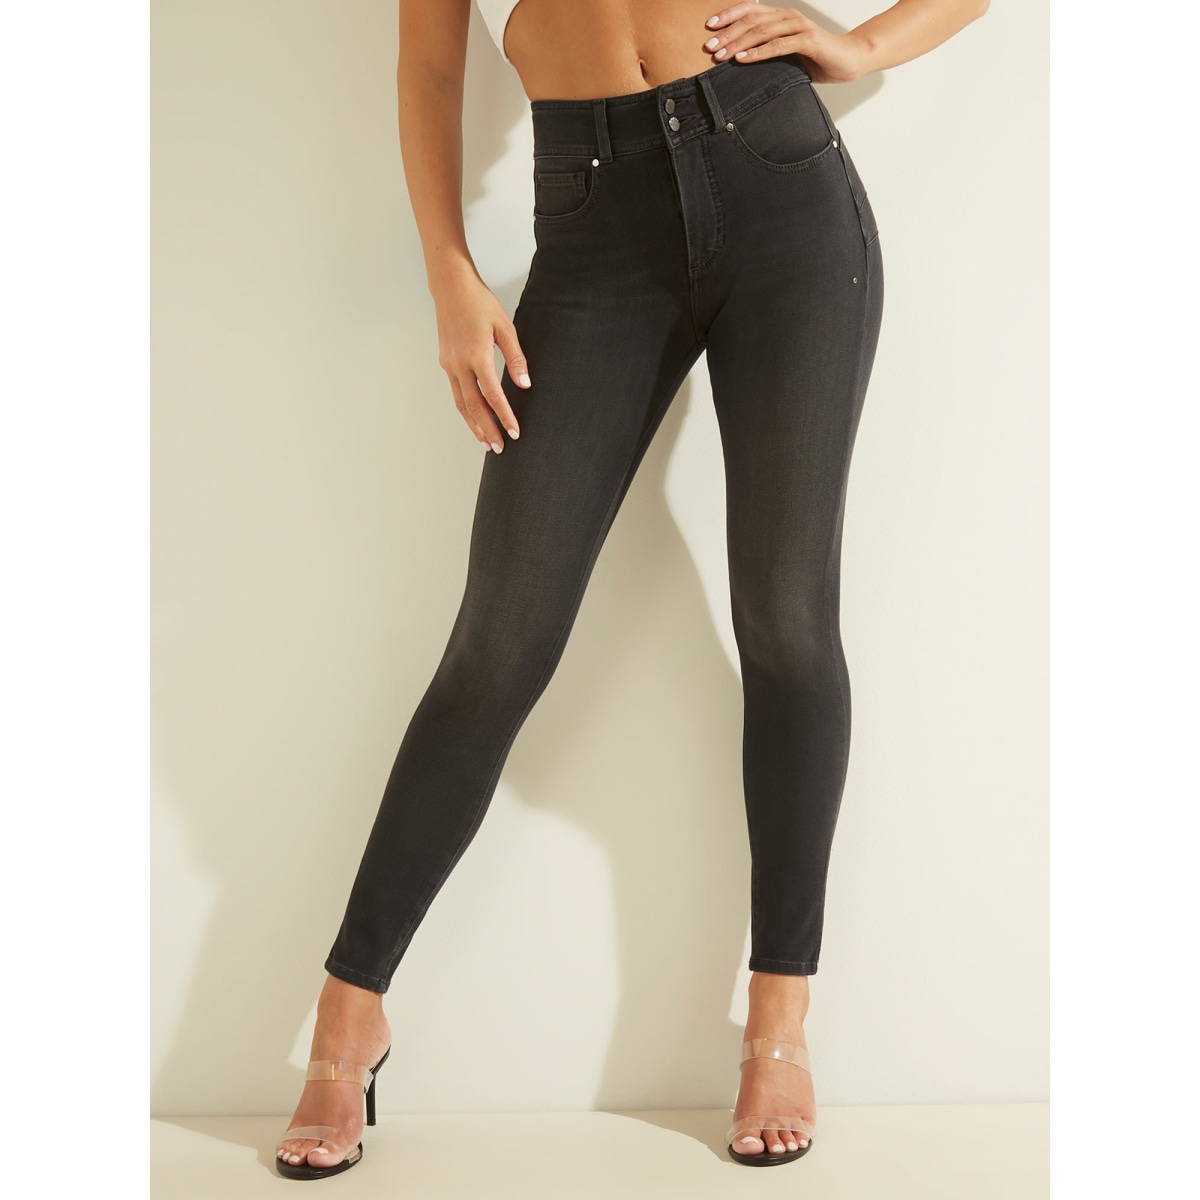 Guess Skinny Fit Kadın Jean Pantolon